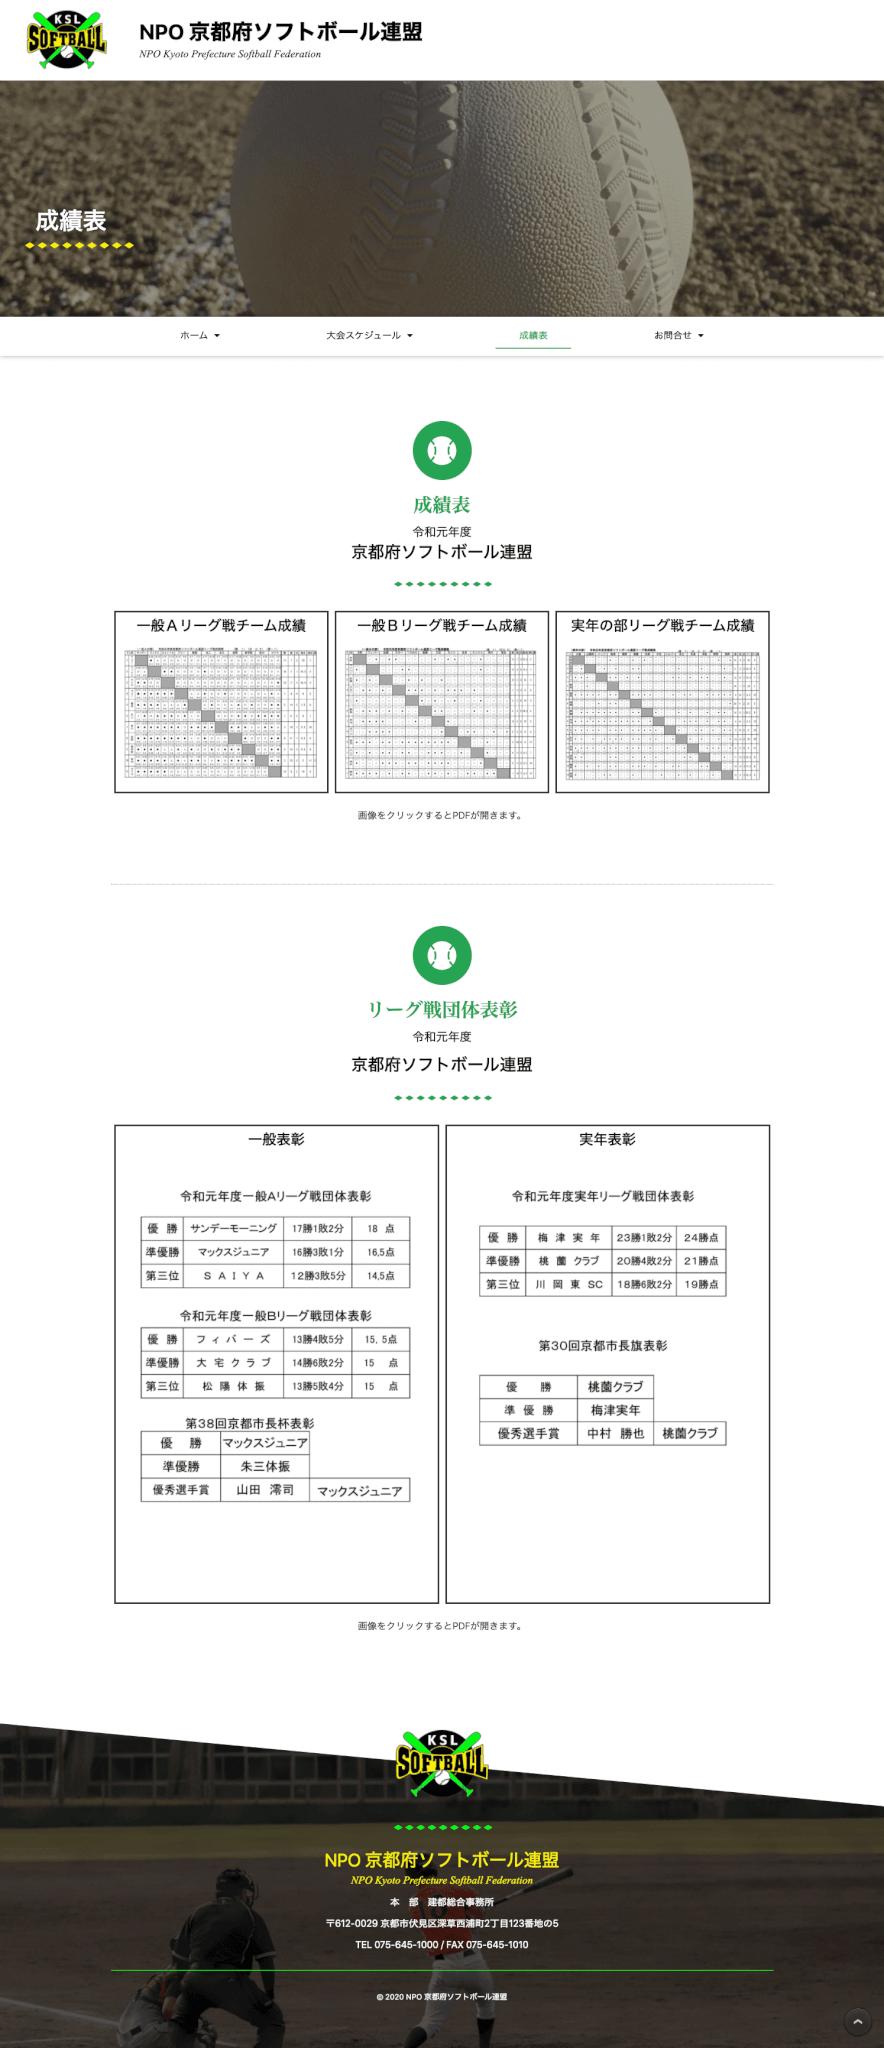 NPO京都府ソフトボール連盟ホームページデザイン